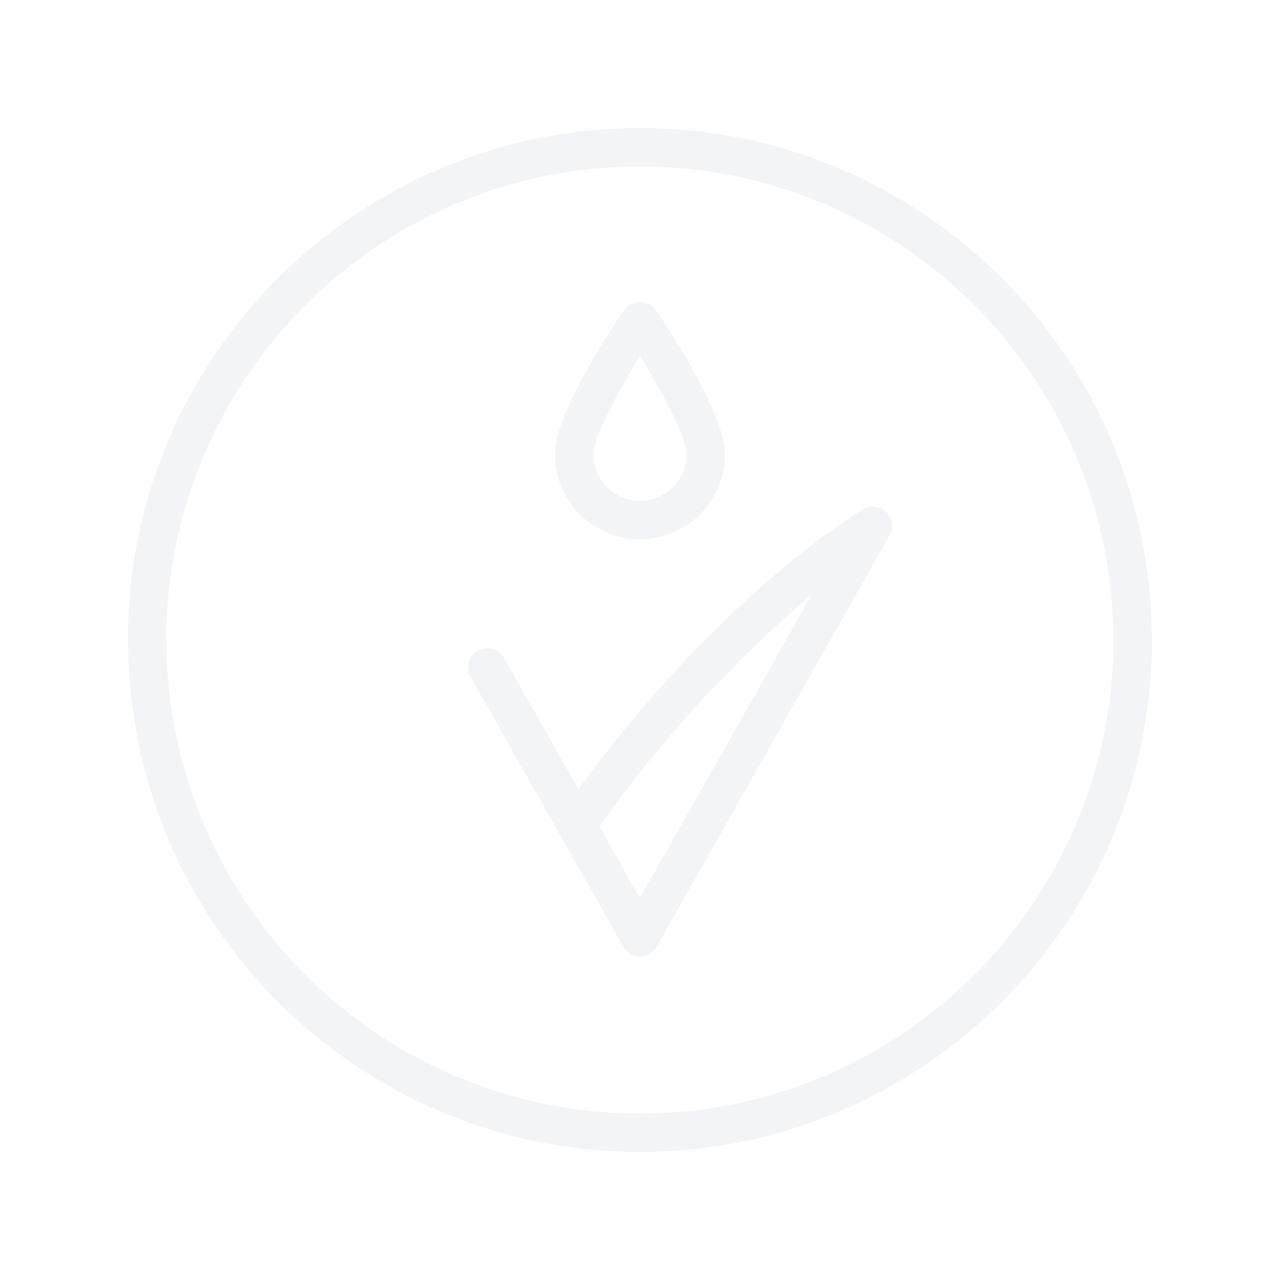 KERASTASE Specifique Hydra Apaisant Cream Gel Treatment 200ml